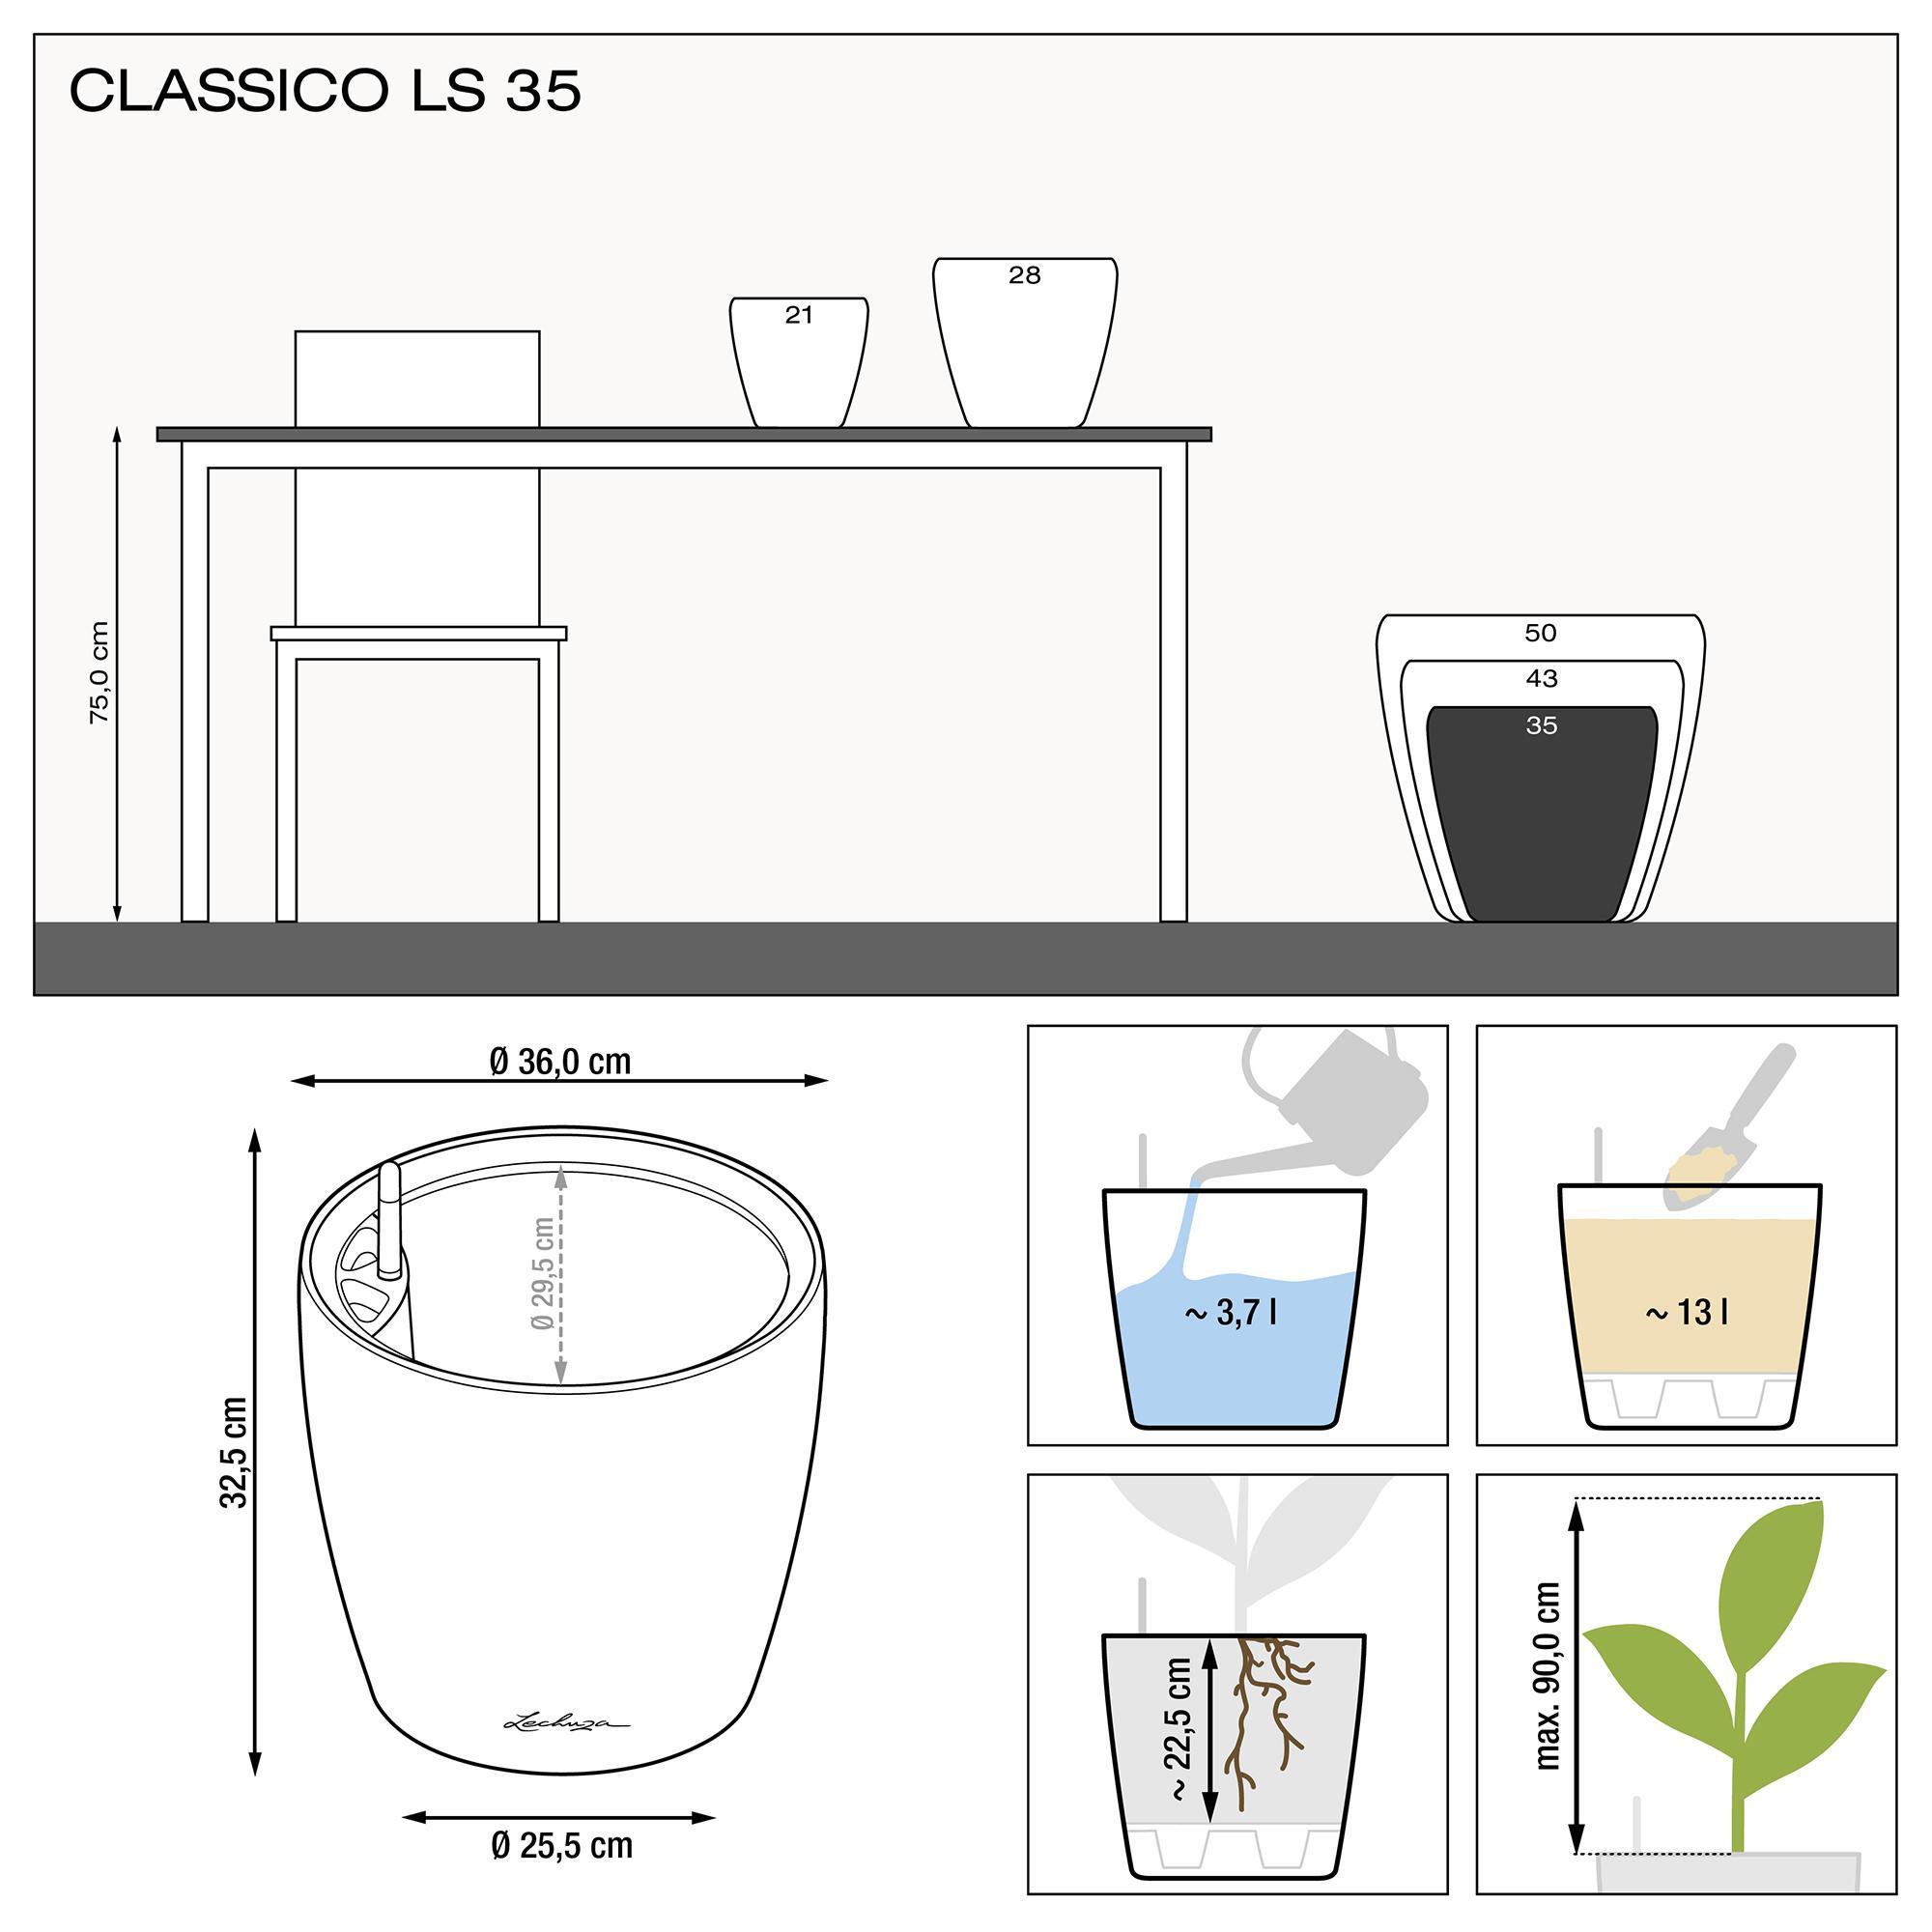 CLASSICO LS 35 white high-gloss - Image 3